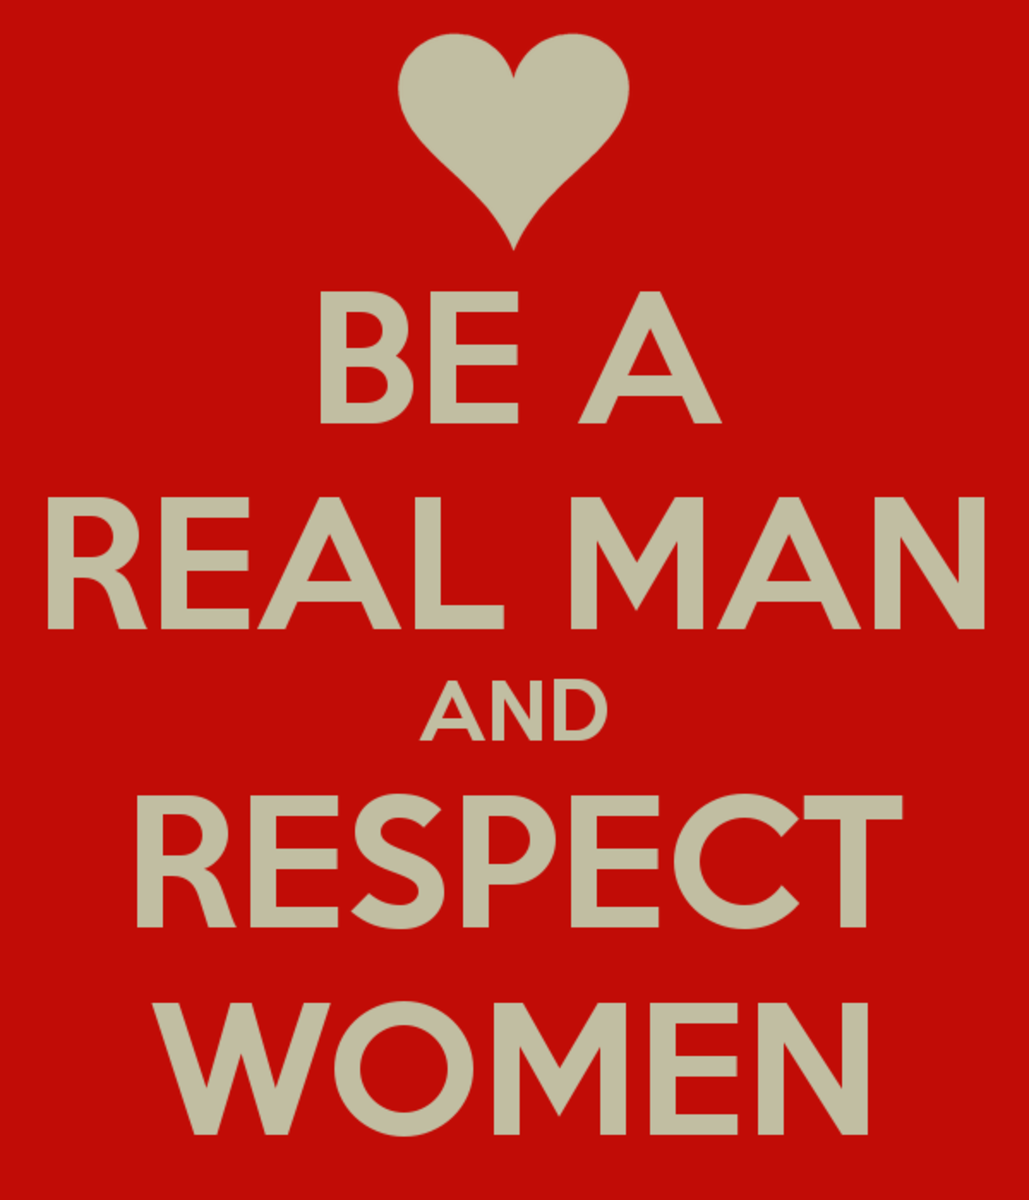 Respecting Women